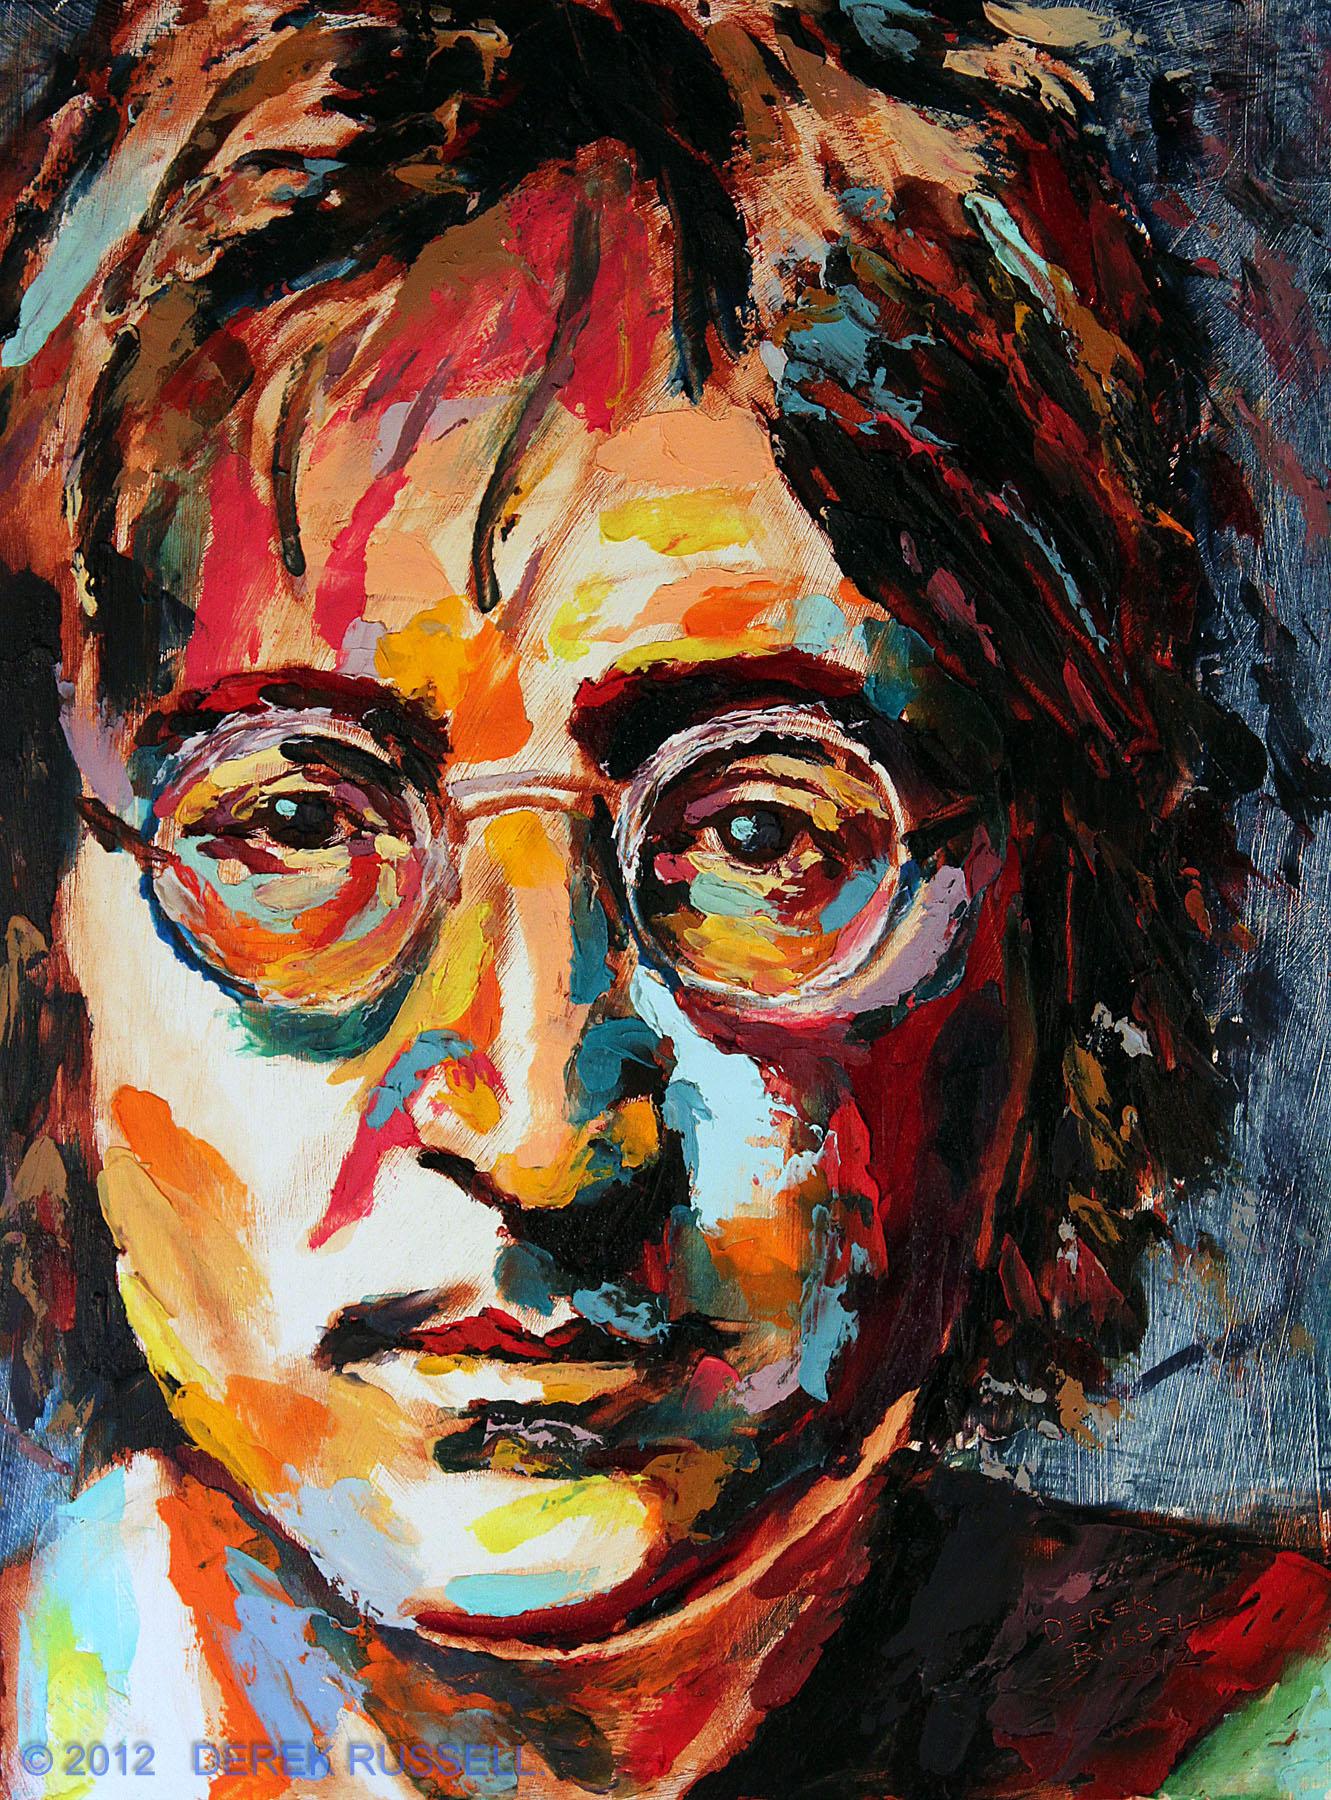 John Lennon Original Oil Pop Portrait Painting by Derek Russell